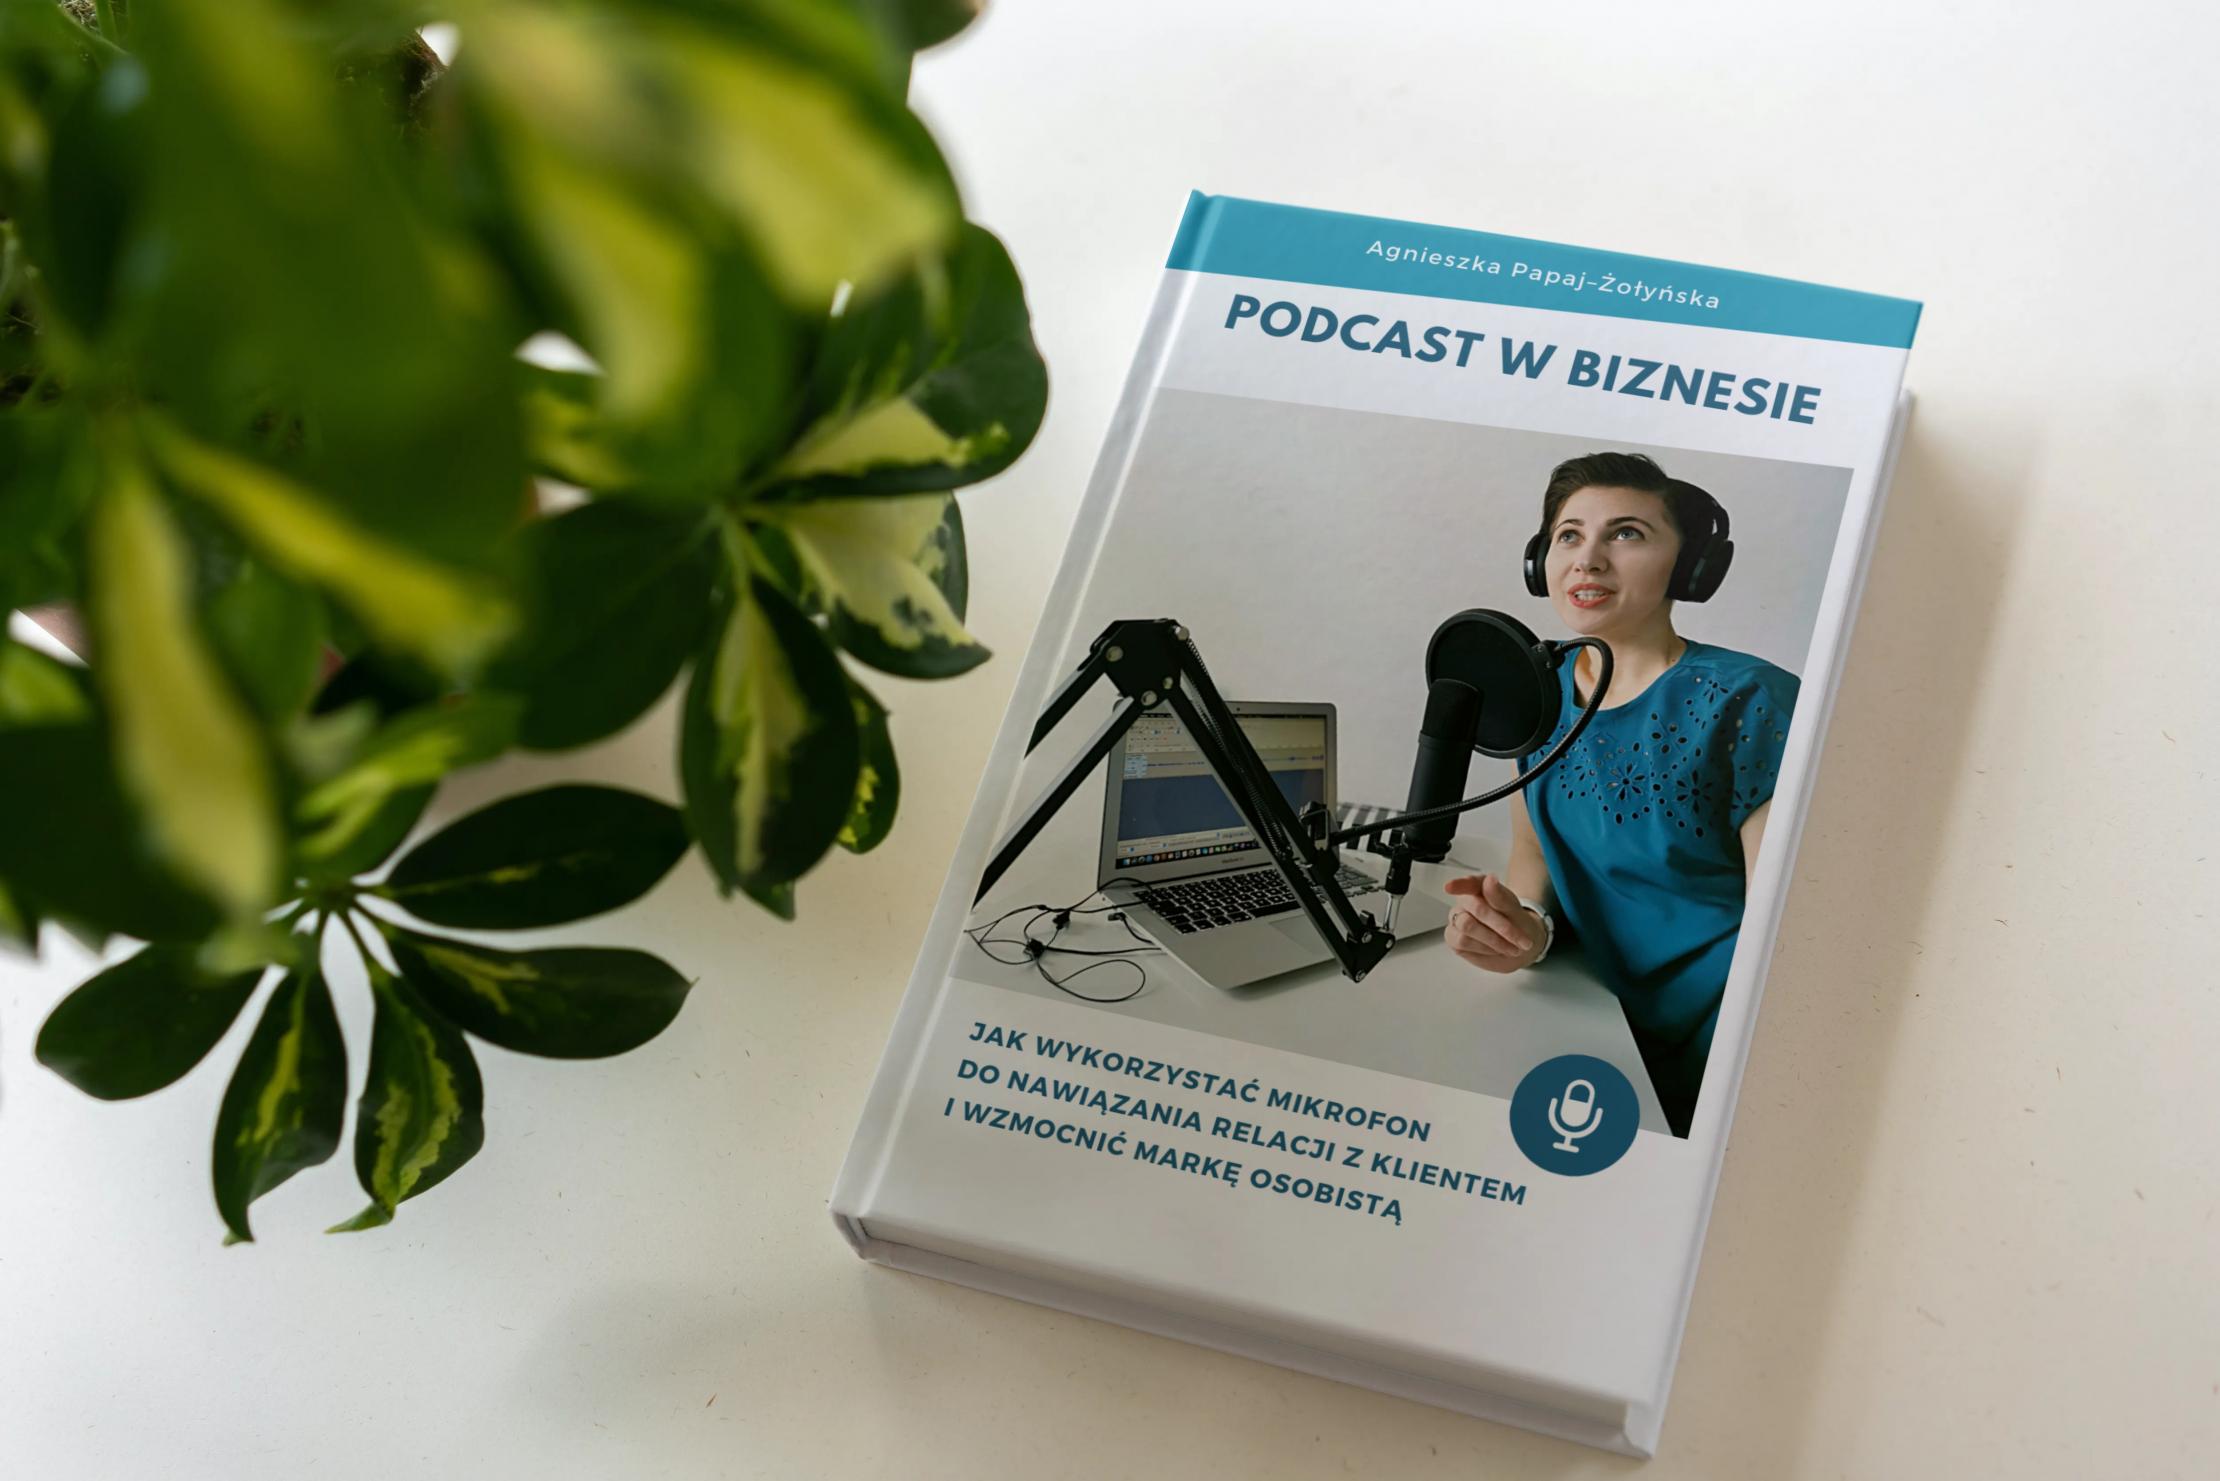 podcast w biznesie wing person